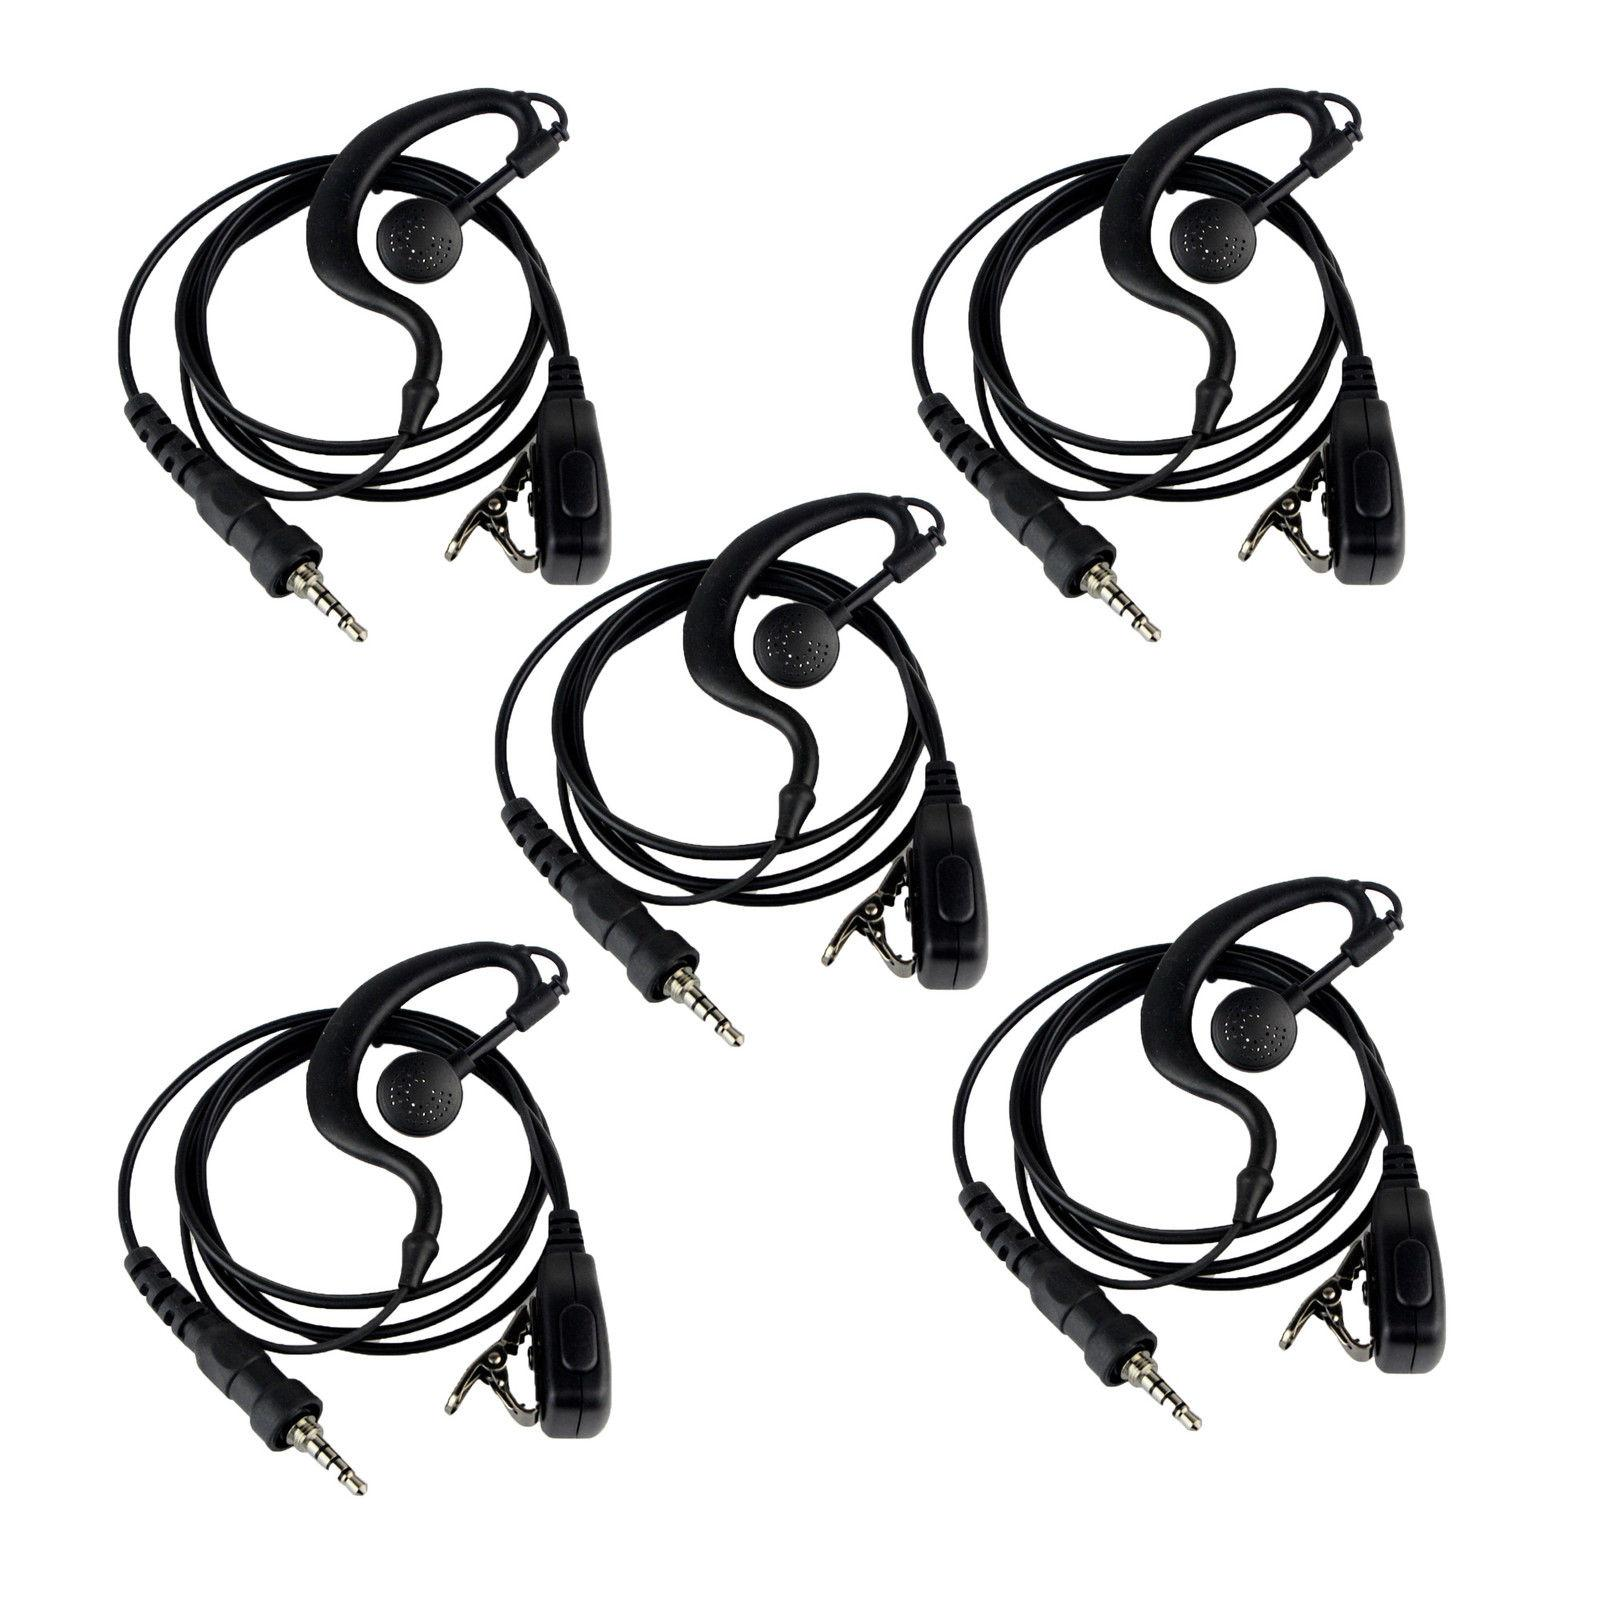 New Sell G-Shape Earpiece Headset PTT MIC for YAESU Vertex VX-6R 7R 170 VXA-710